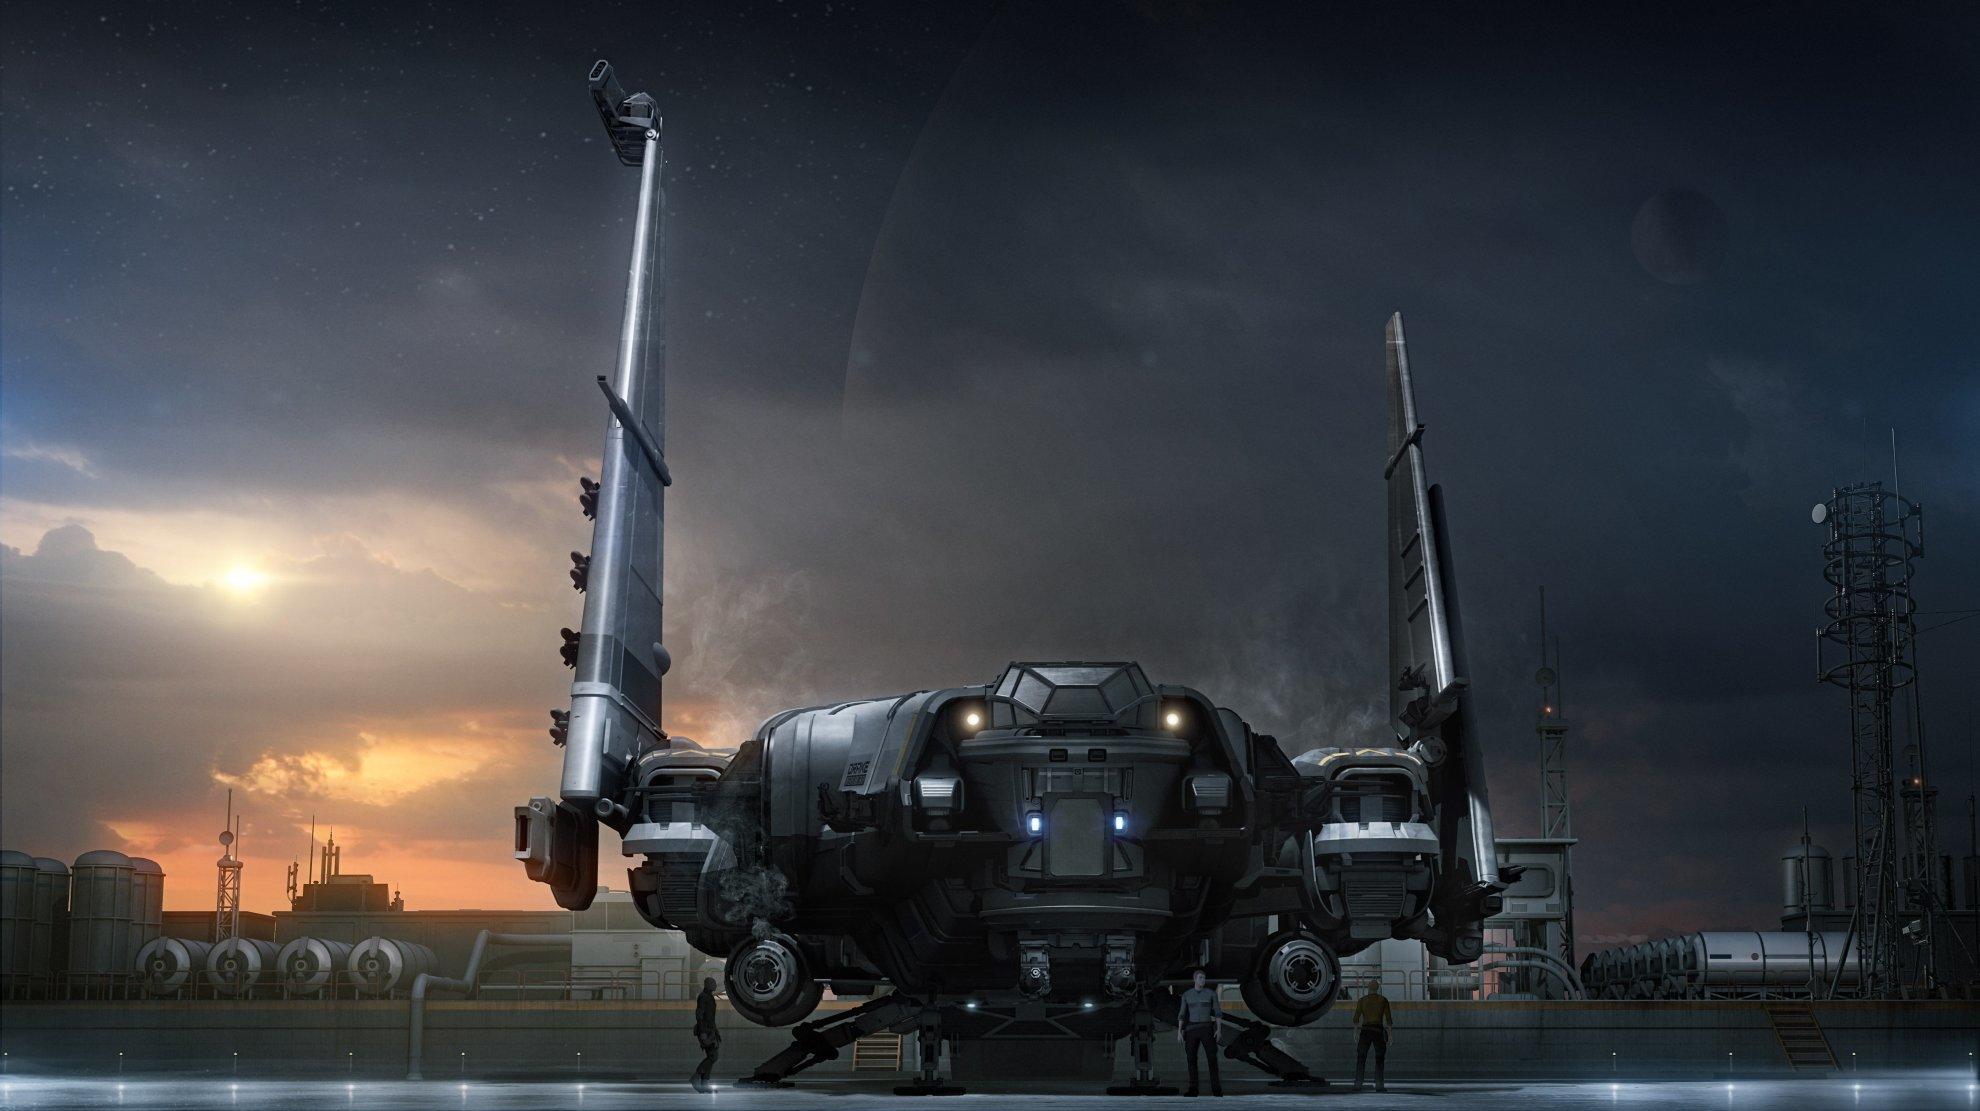 Drake Corsair - platforma do uzupełniania paliwa